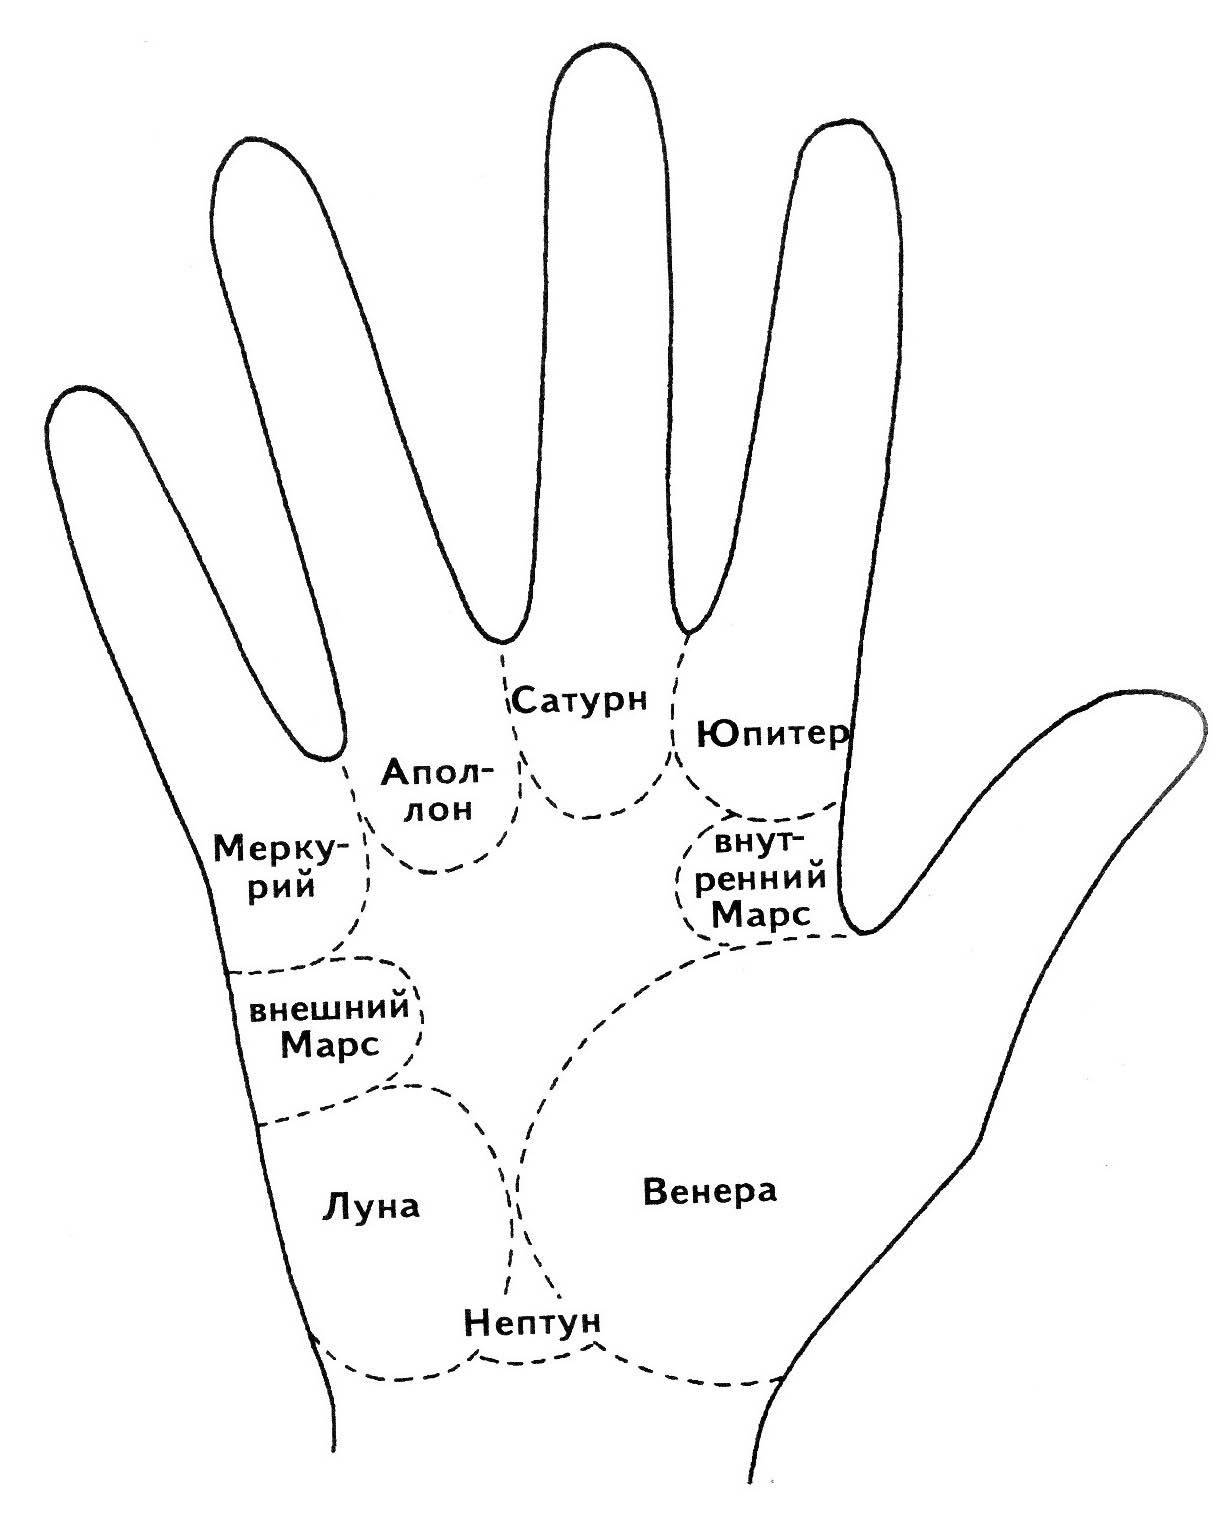 Холм луны на руке: звезда, линии, треугольник, крест на ладони